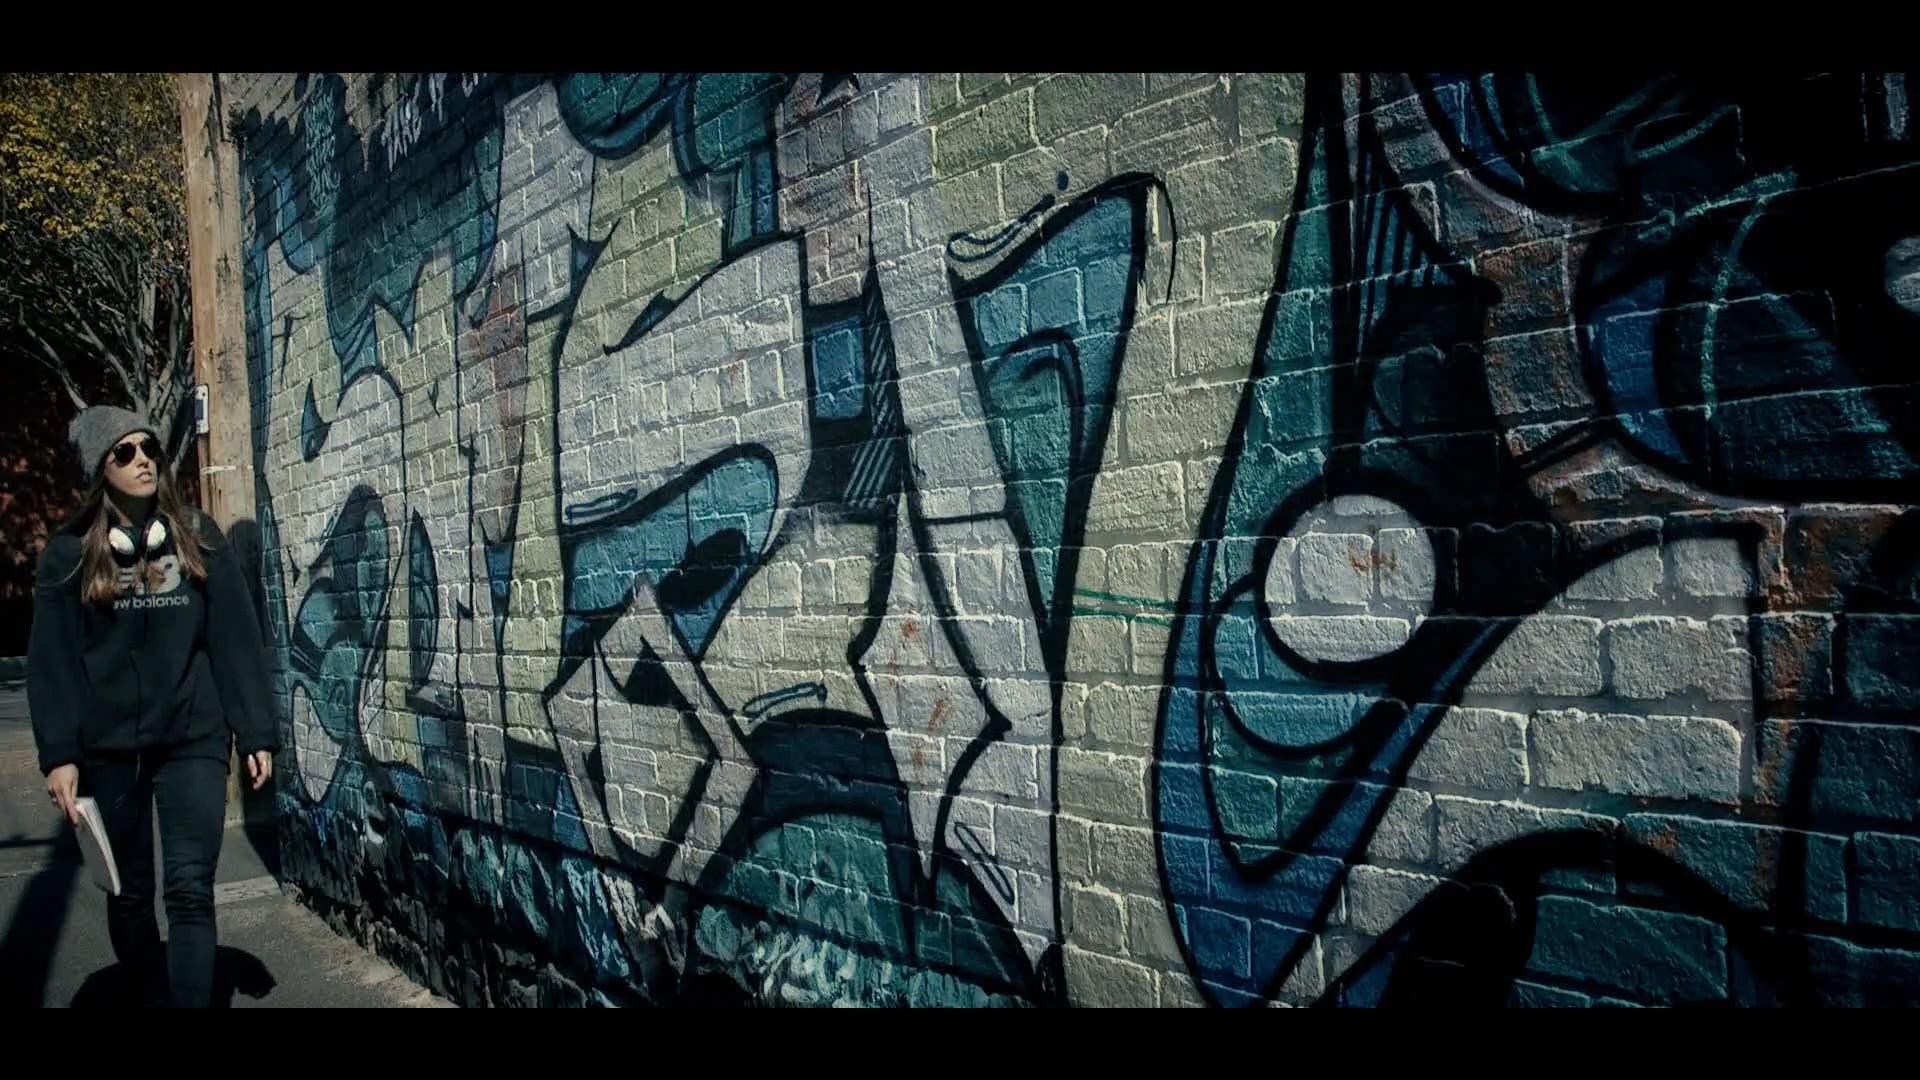 Sketch - Street Art